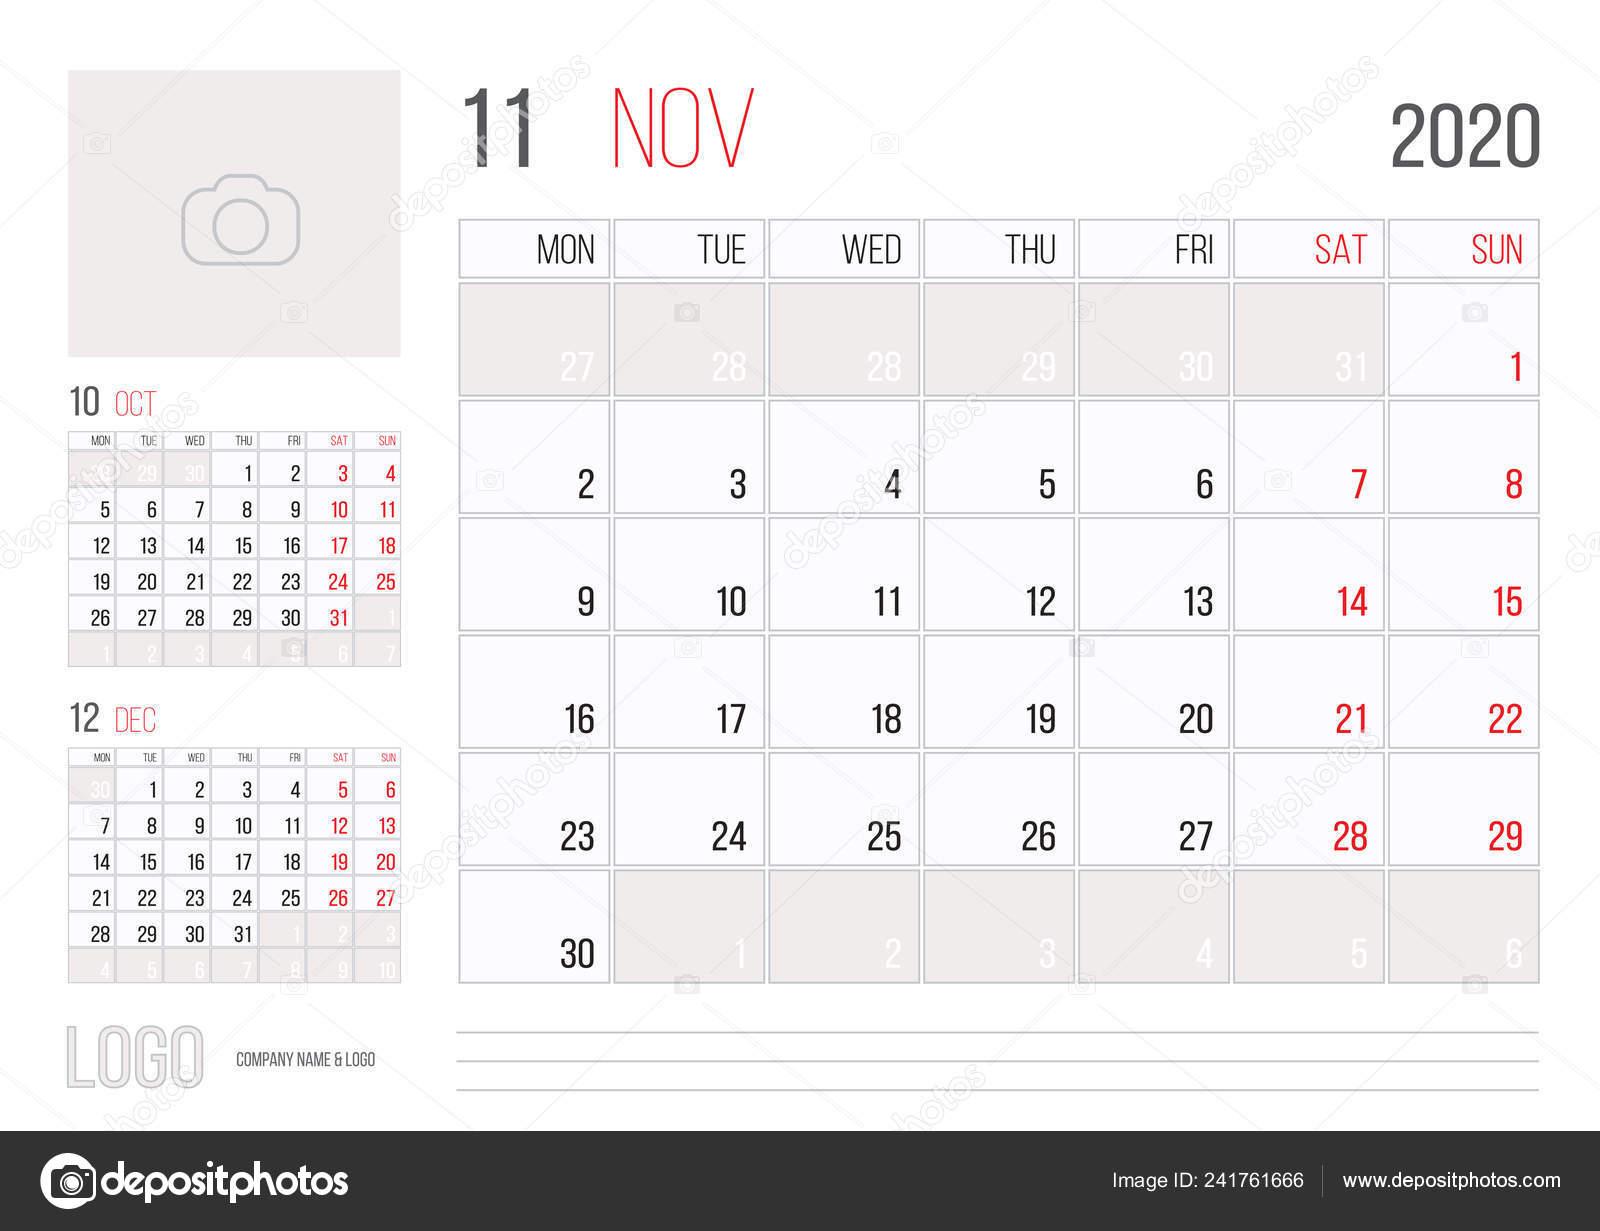 2020 Annual Calendar.Calendar 2020 Planner Corporate Template Design November Month Week